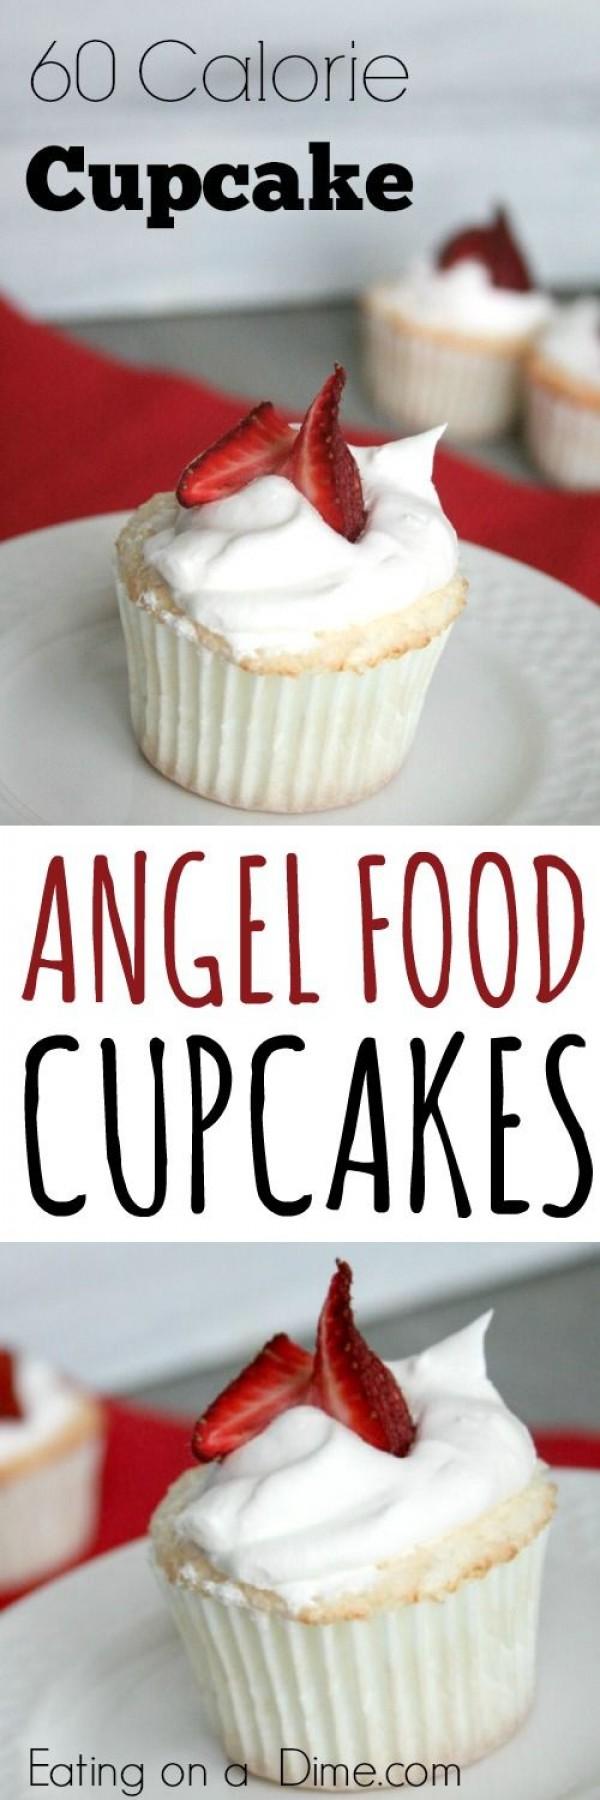 Get teh recipe Angel Food Cupcakes @recipes_to_go